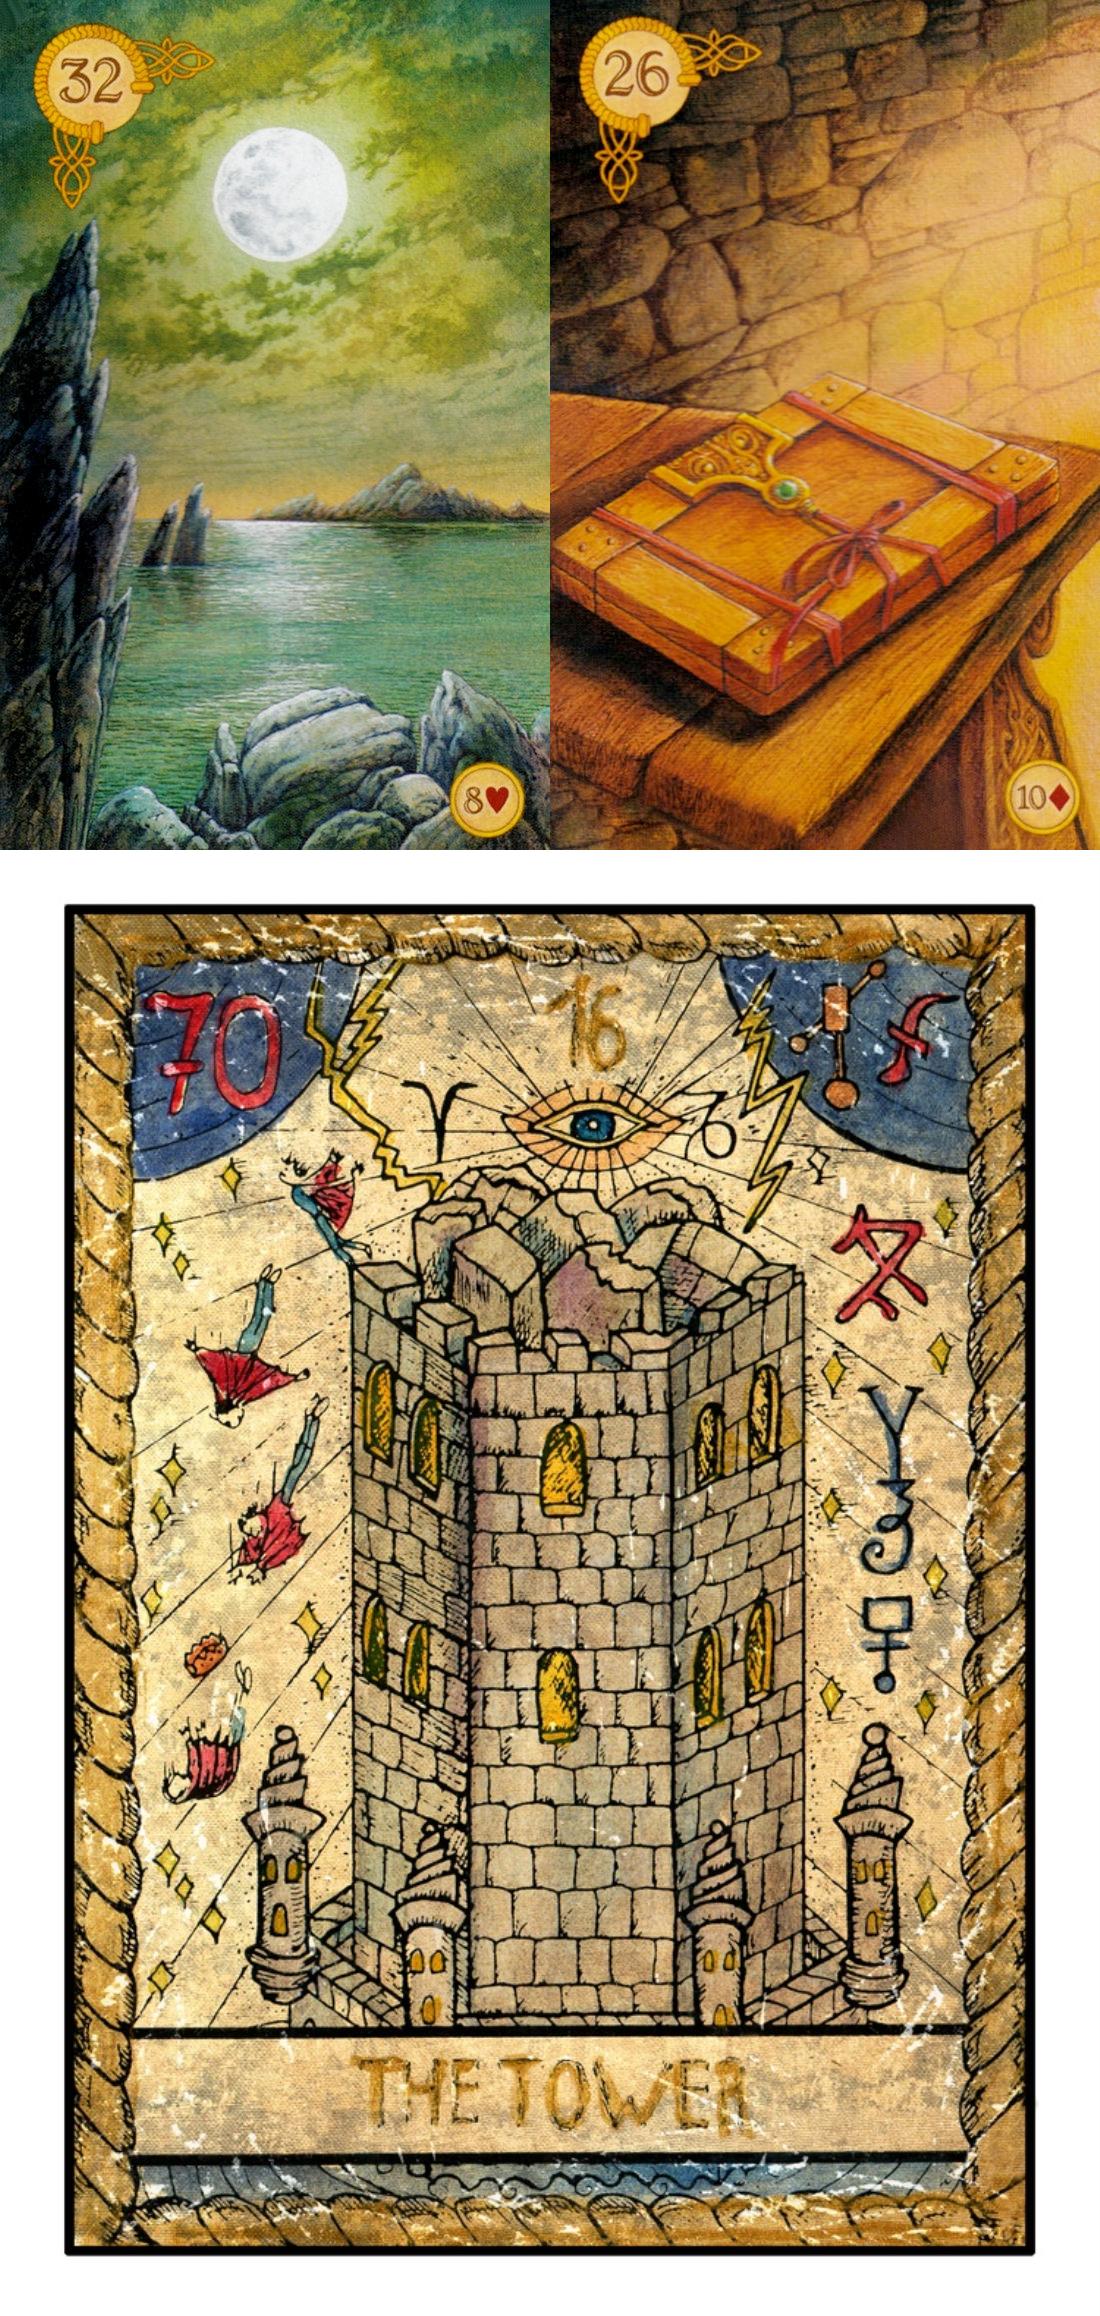 gilded reverie lenormand card meanings, list of tarot card